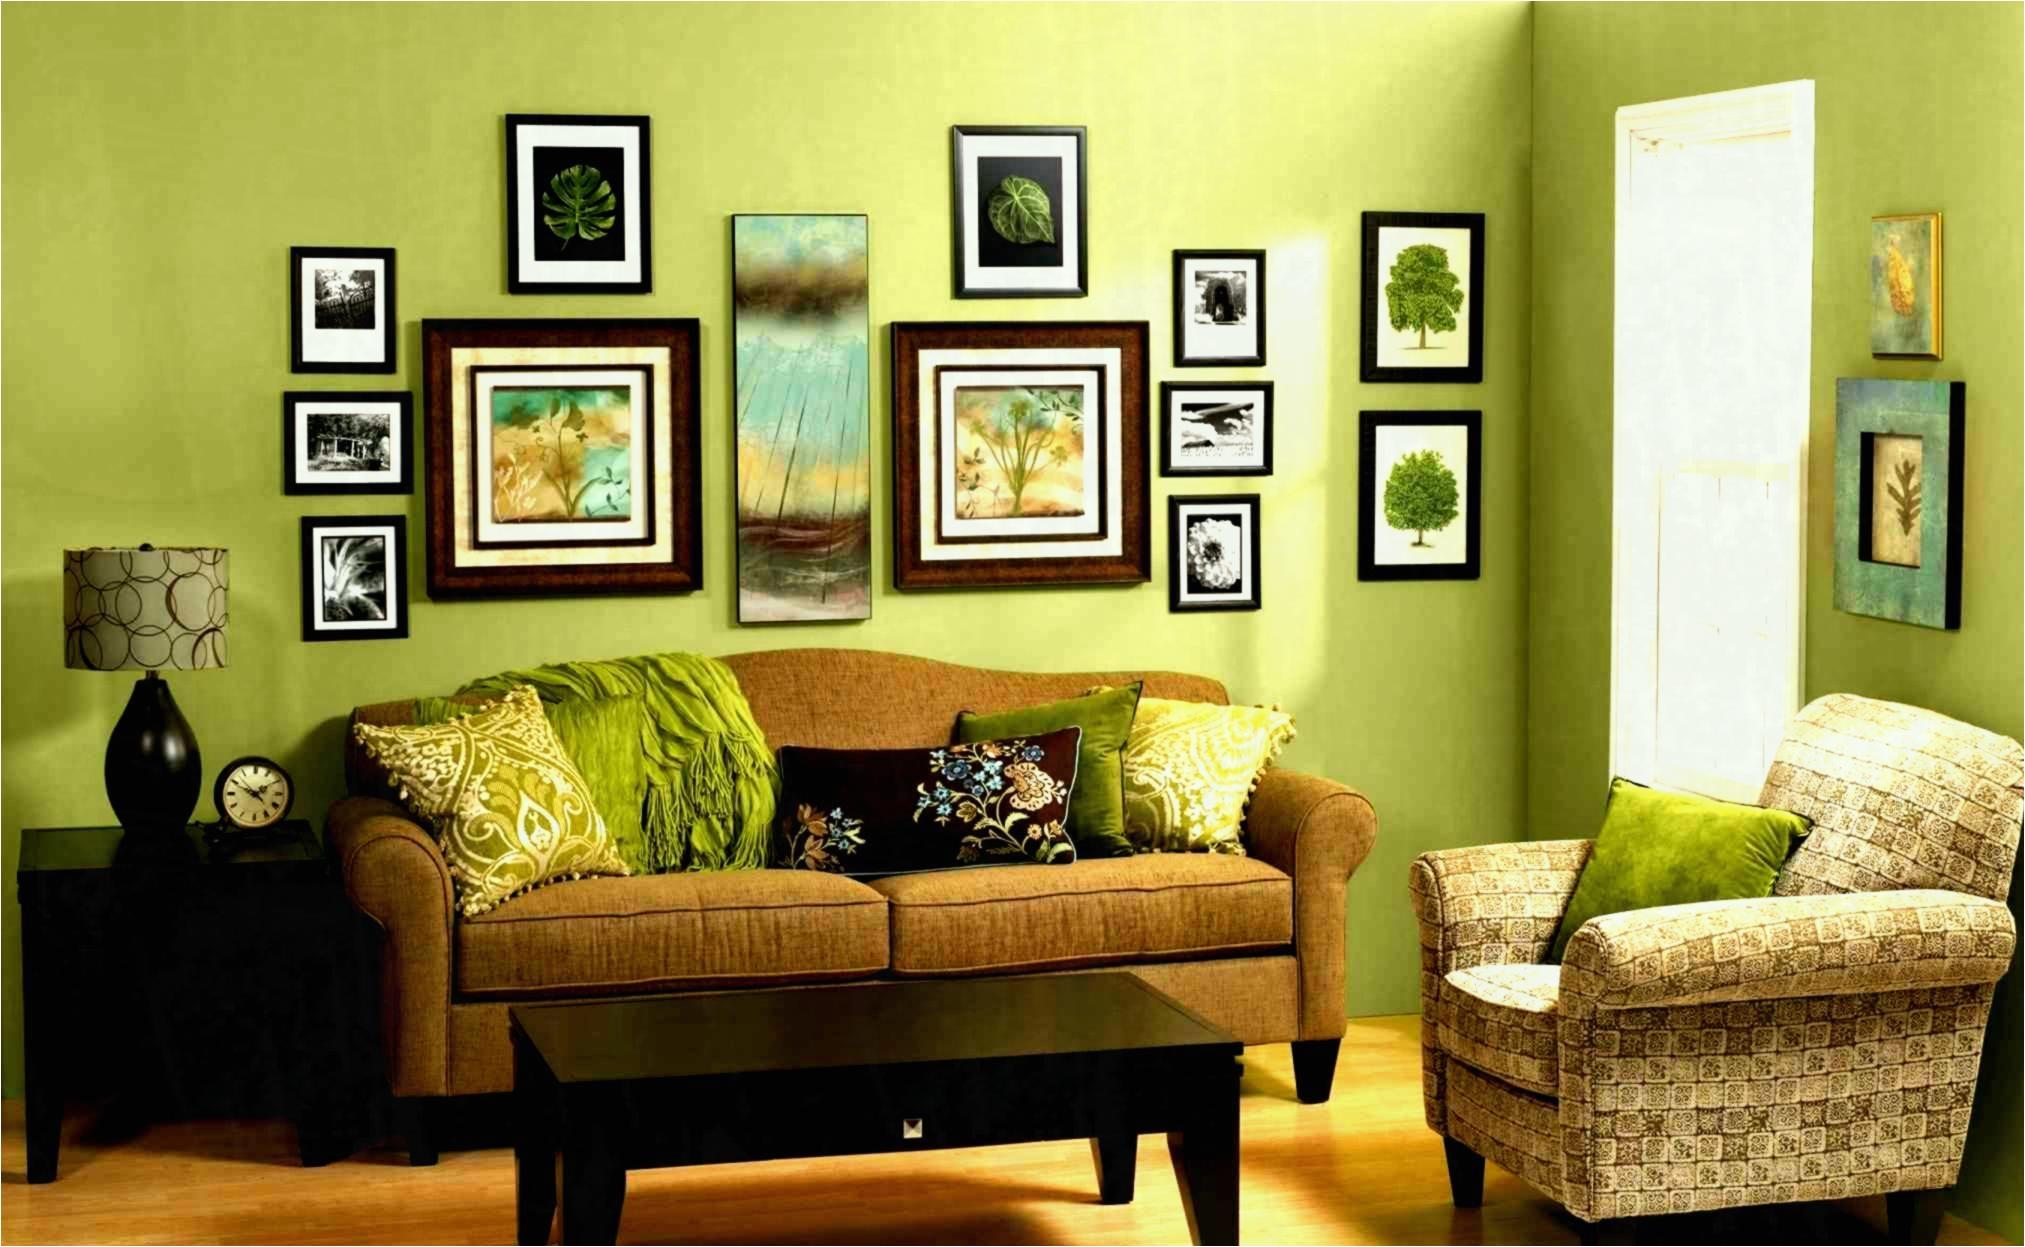 diy home decor ideas pinterest pinterest home decorating ideas on a